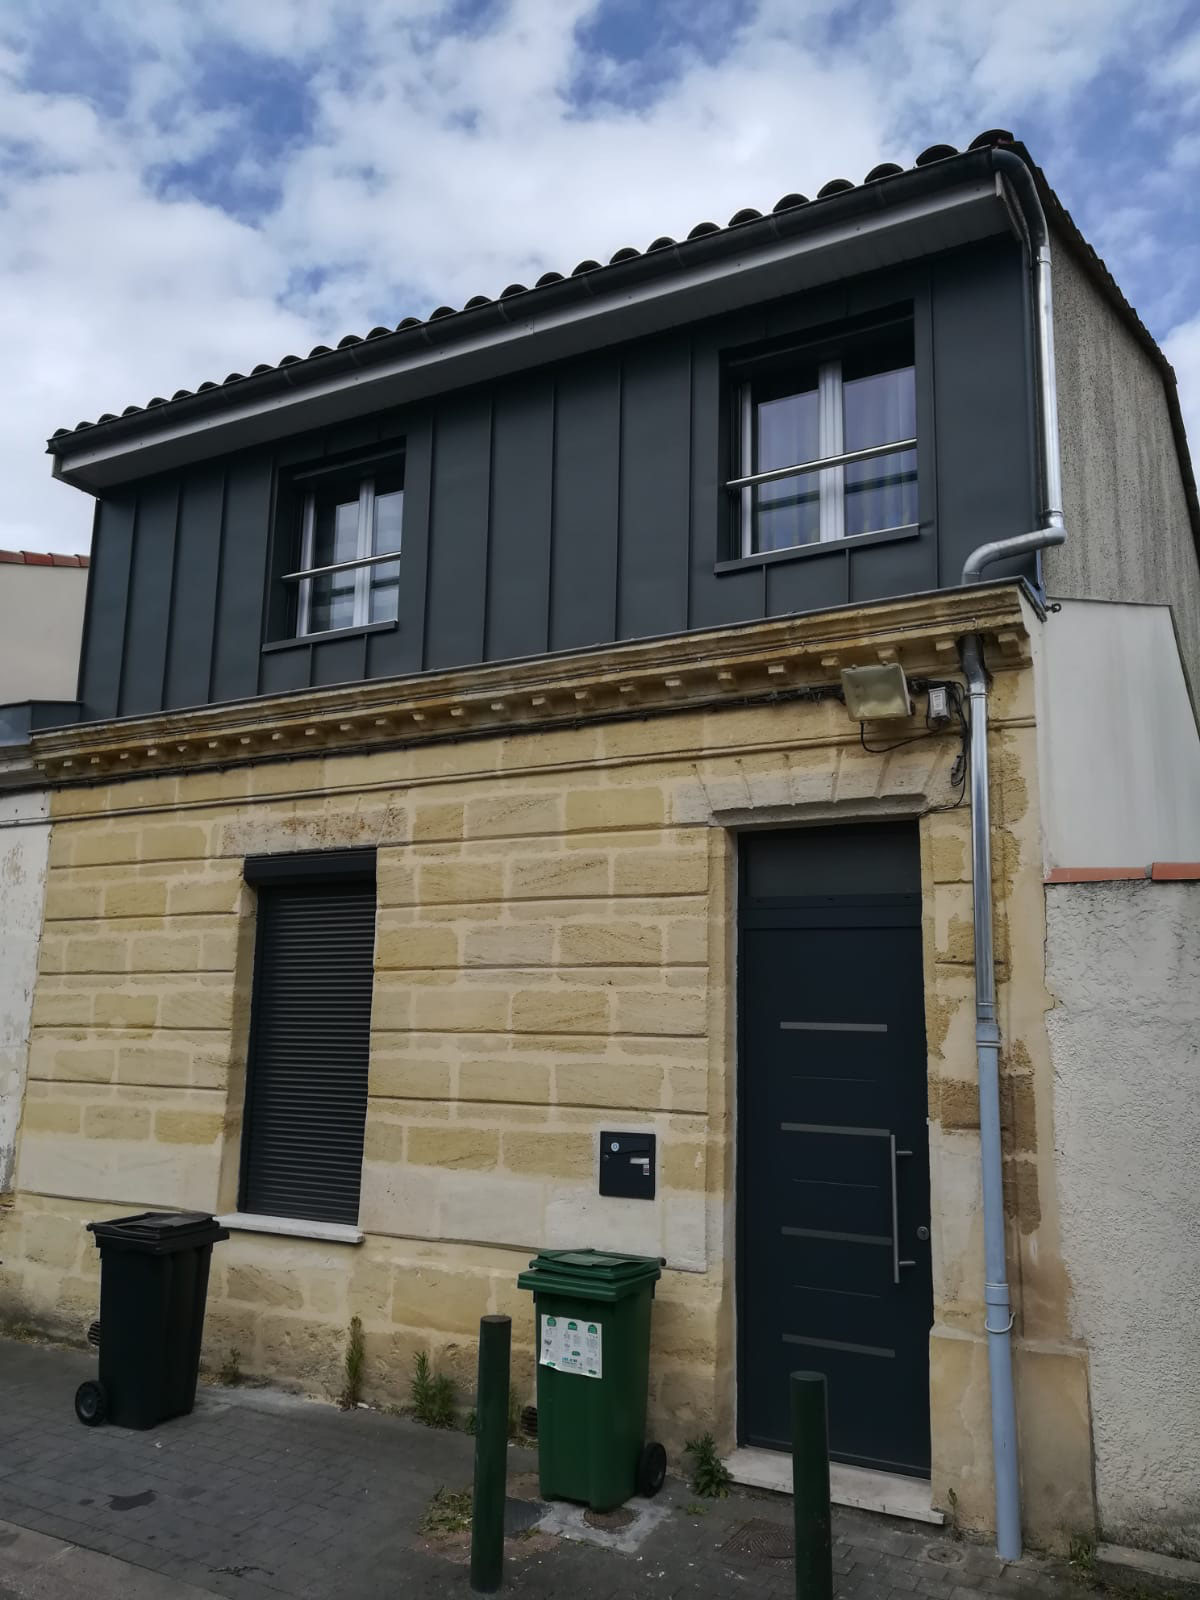 Exemple De Bardage Exterieur bardage facade exterieur - toitures 33 - bordeaux gironde